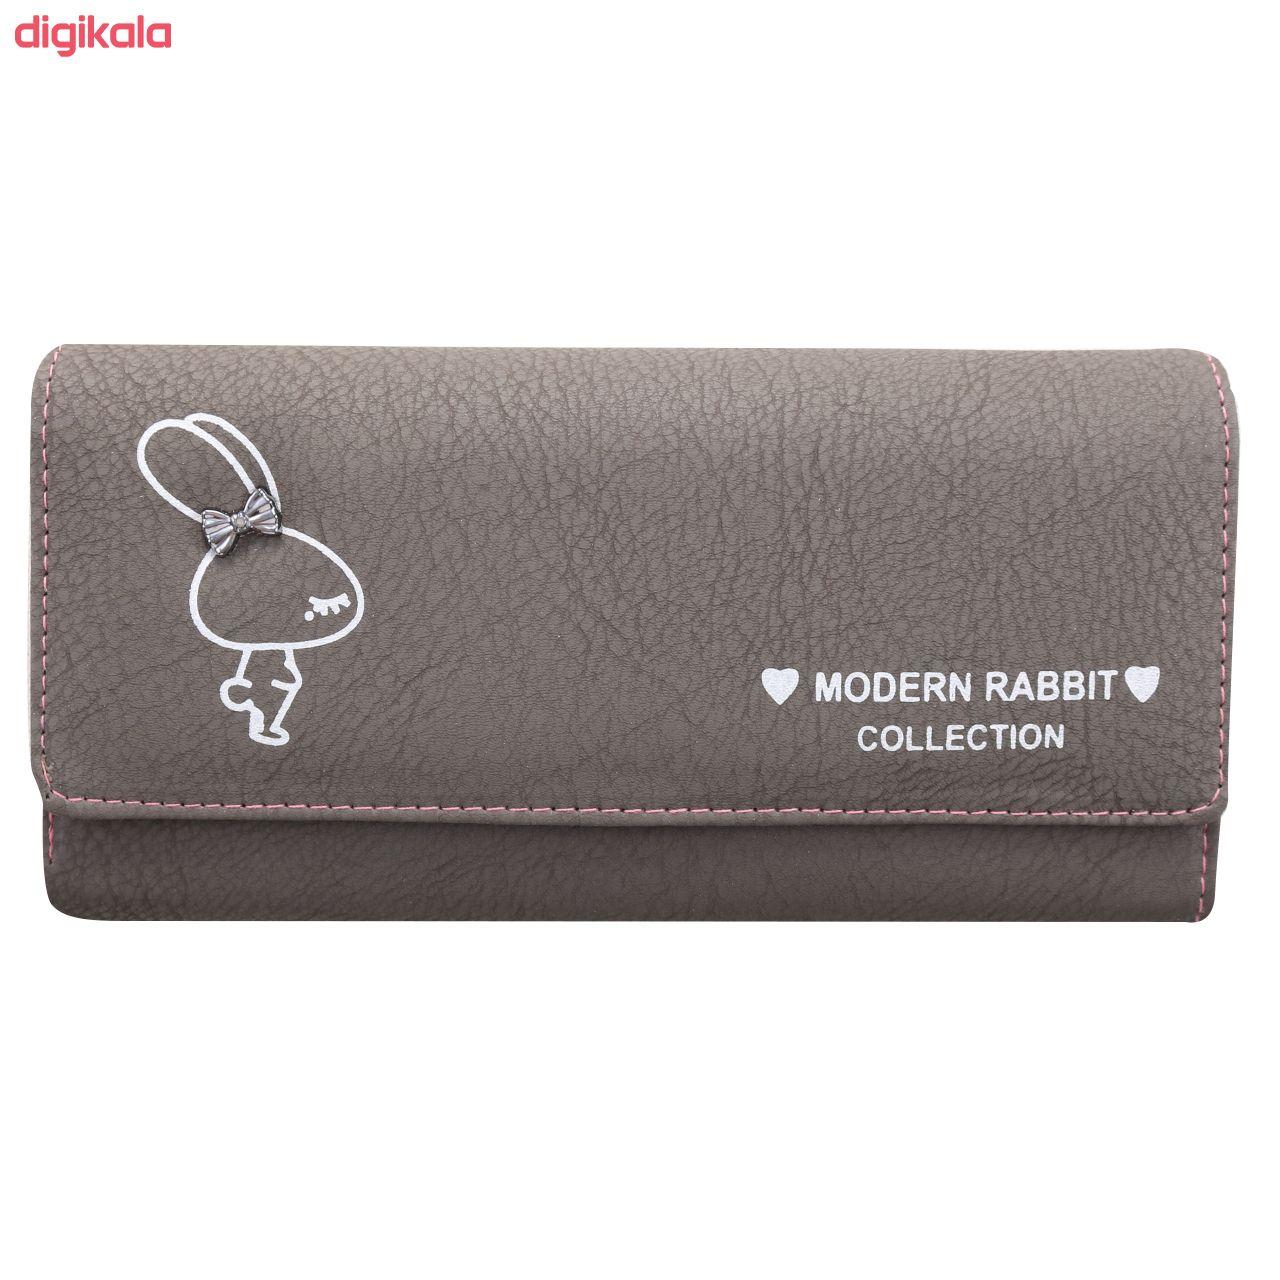 کیف پول زنانه طرح خرگوش کد BG 33 main 1 12